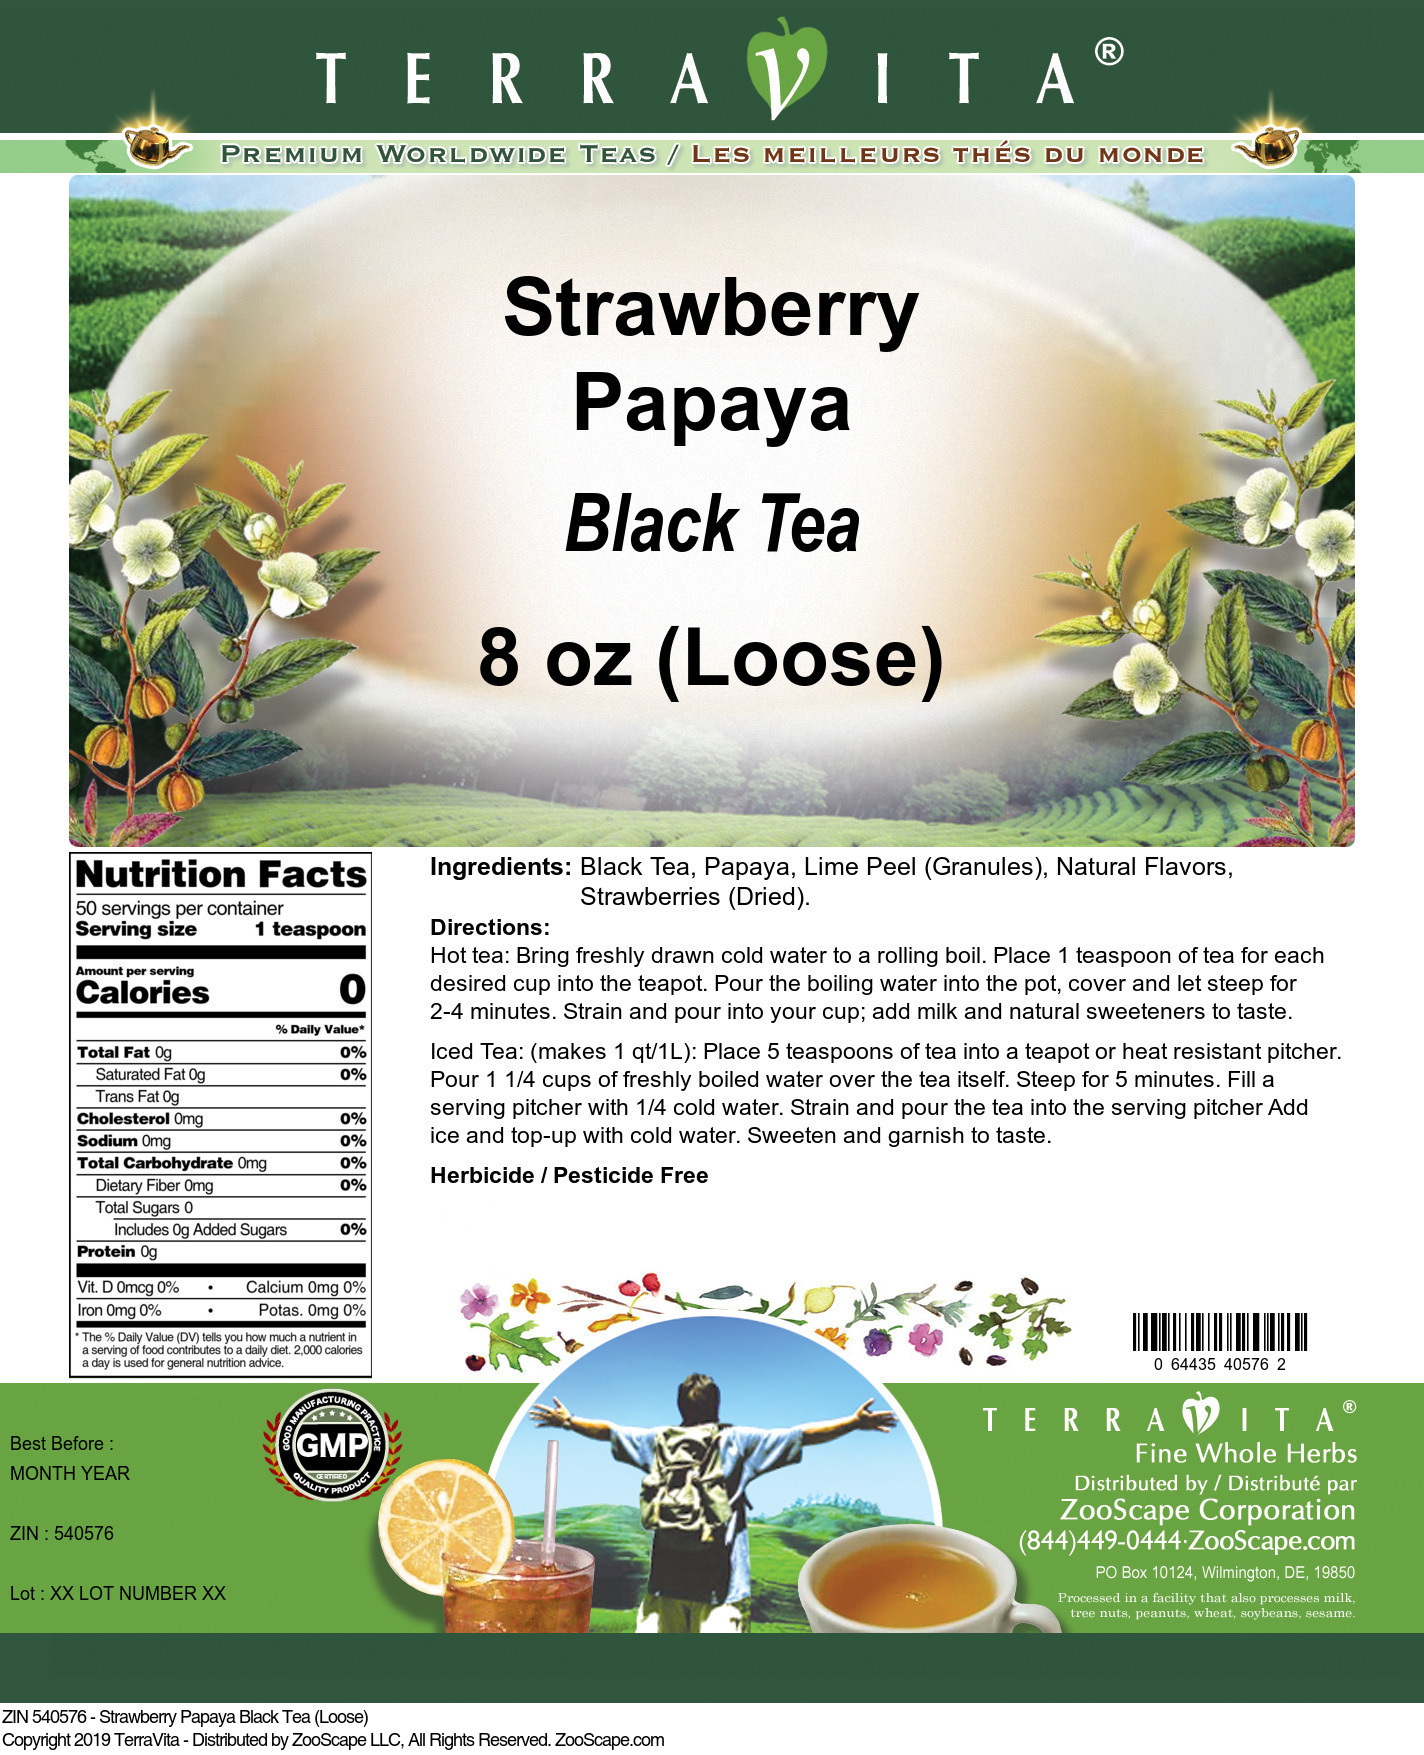 Strawberry Papaya Black Tea